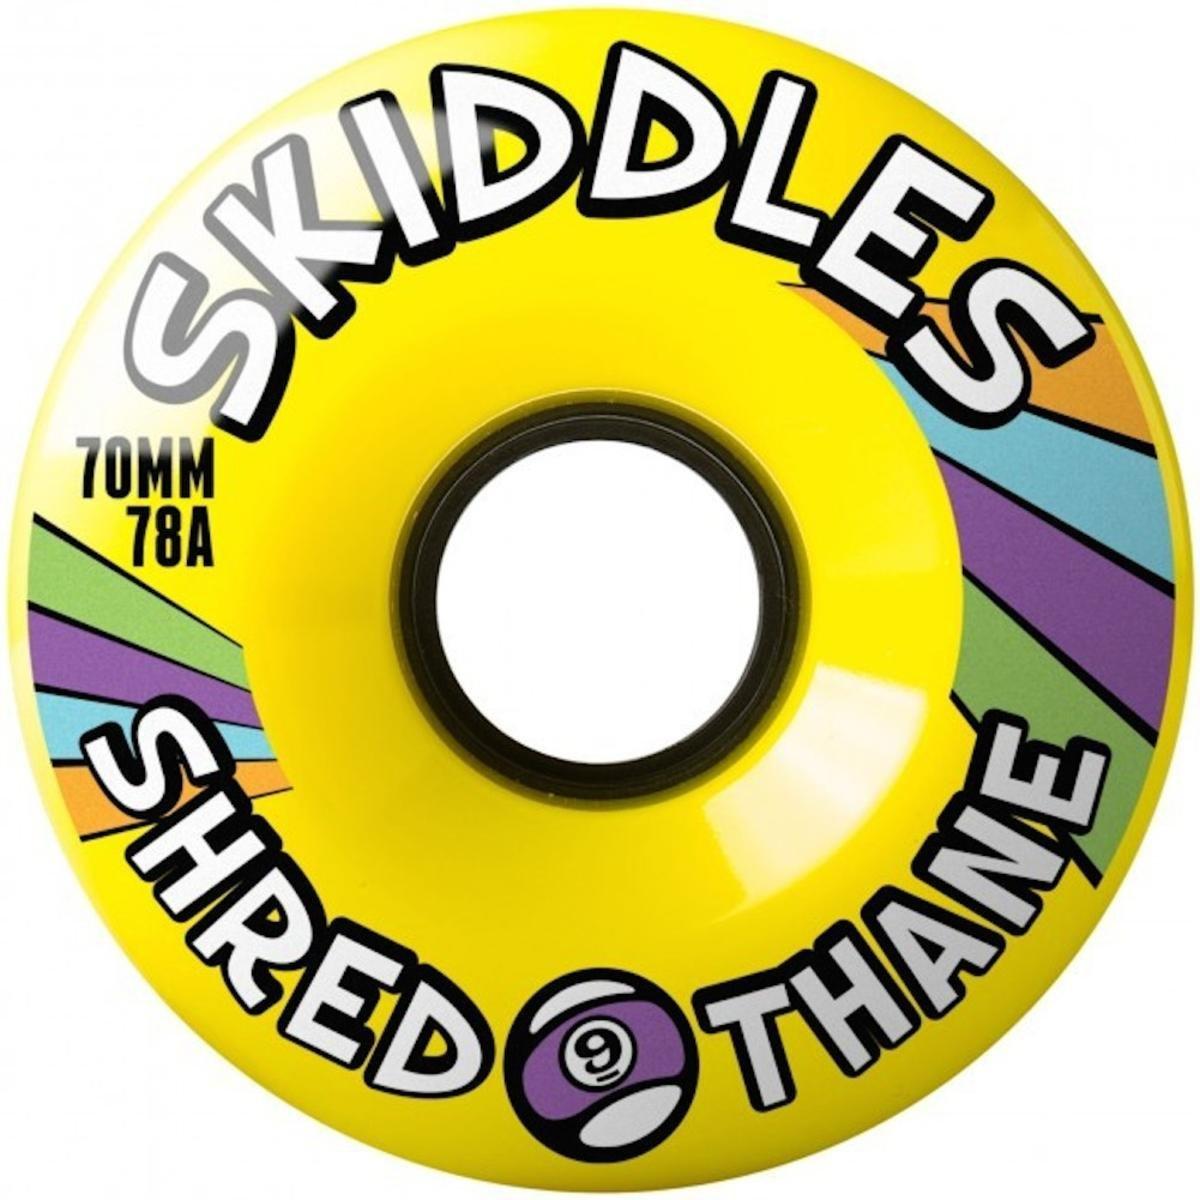 Skiddles Sector 9 70Mm 78A (4)